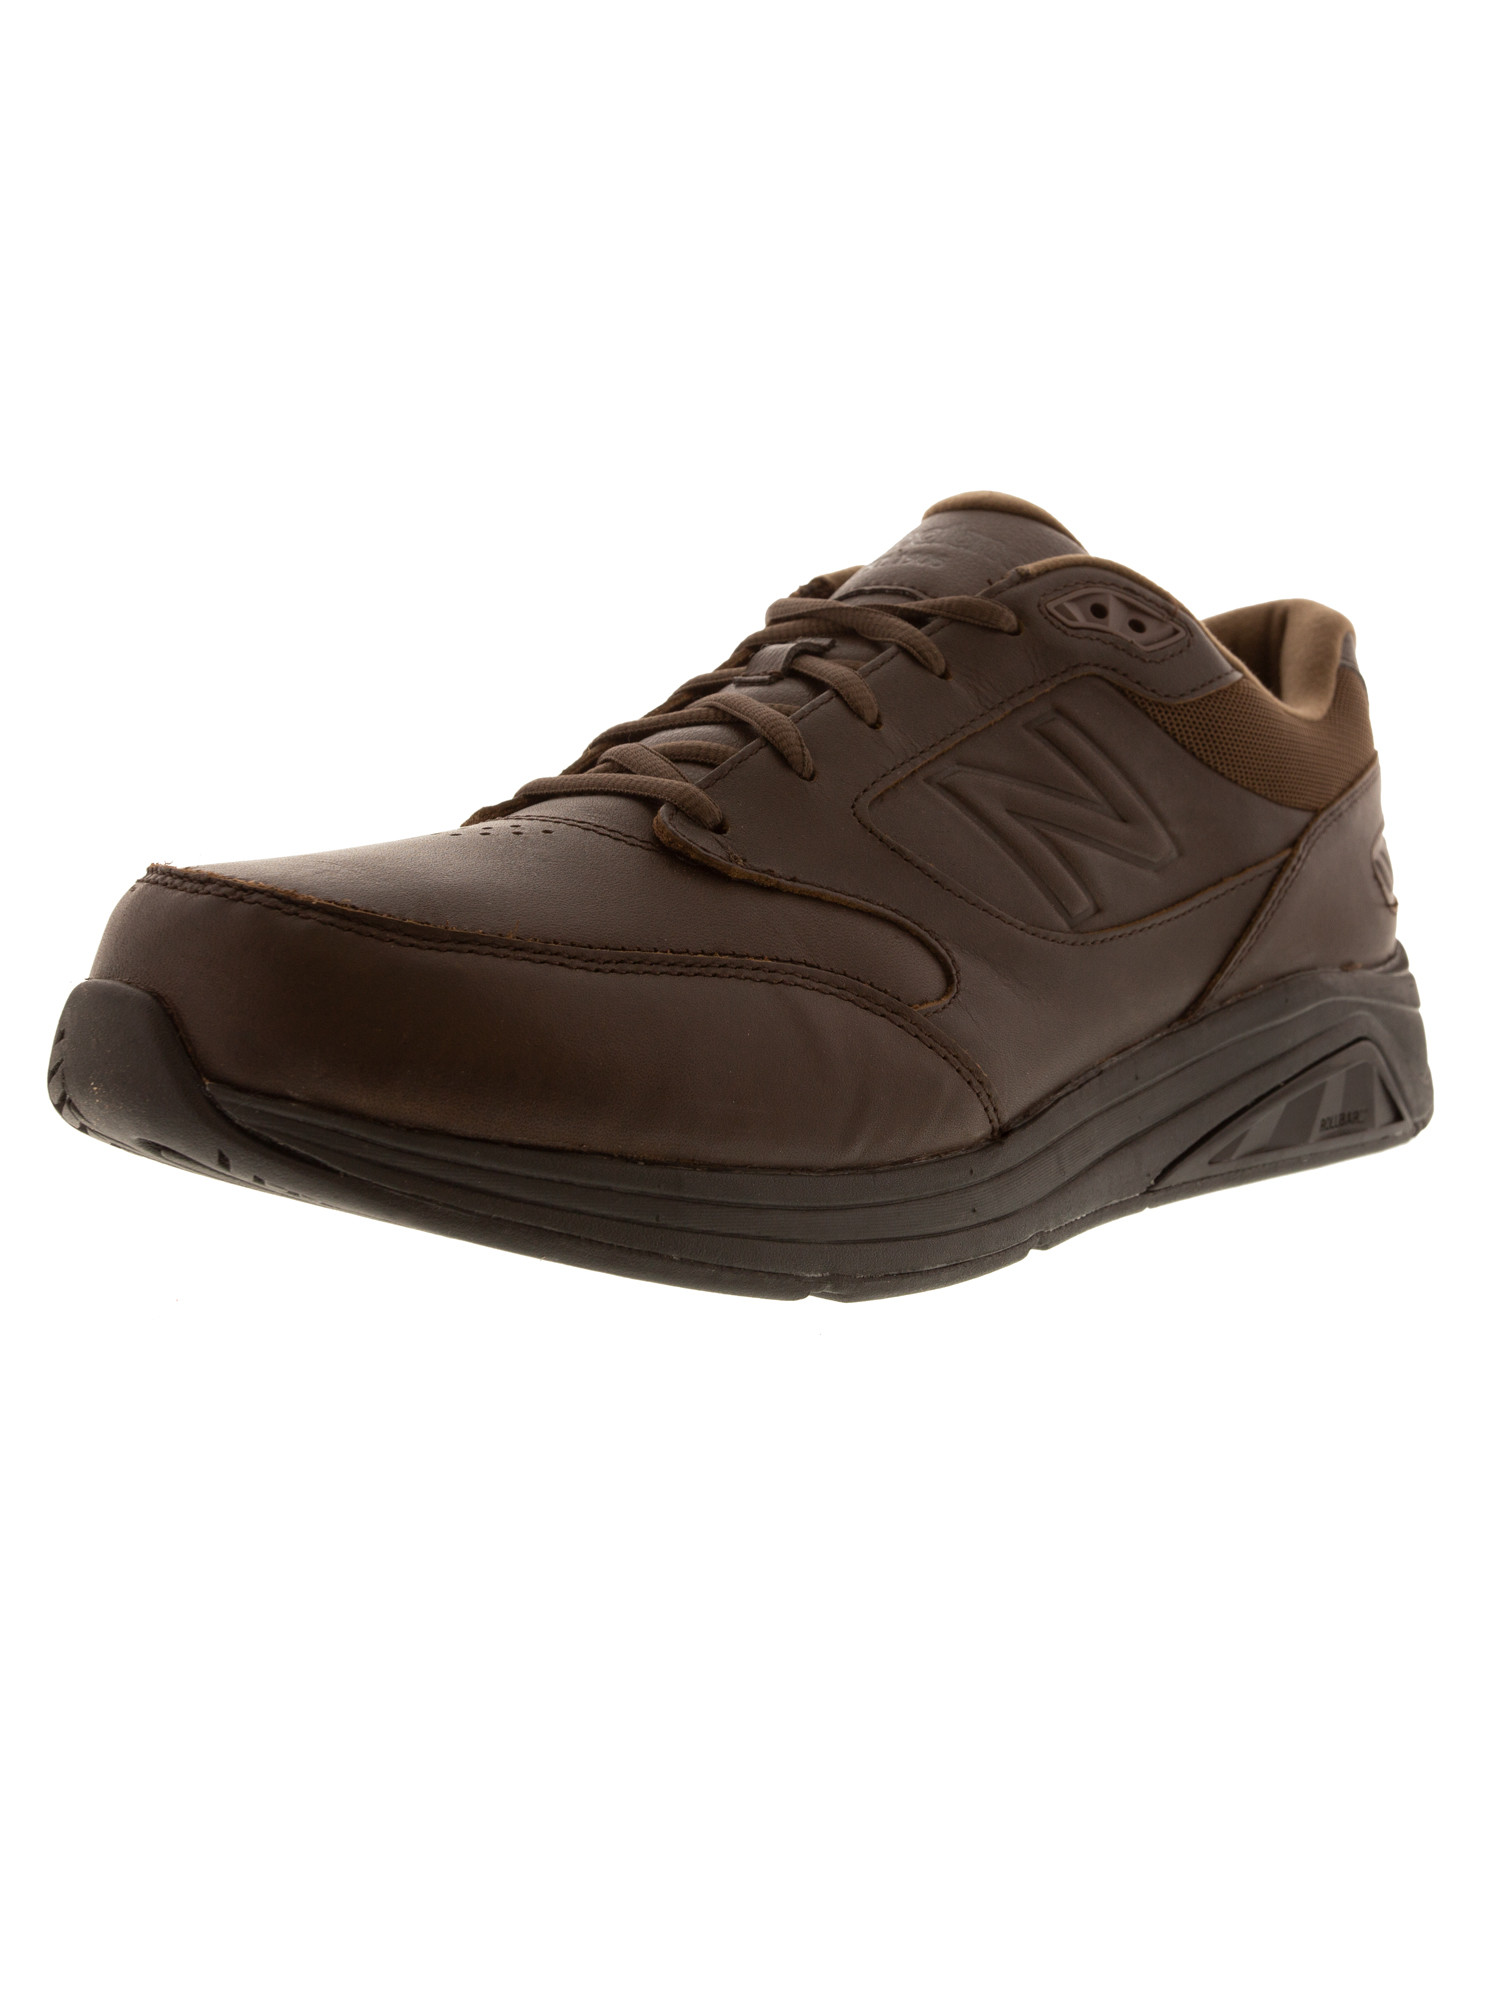 New Balance Men's Mw928 Hb3 Ankle-High Walking Shoe - 9N